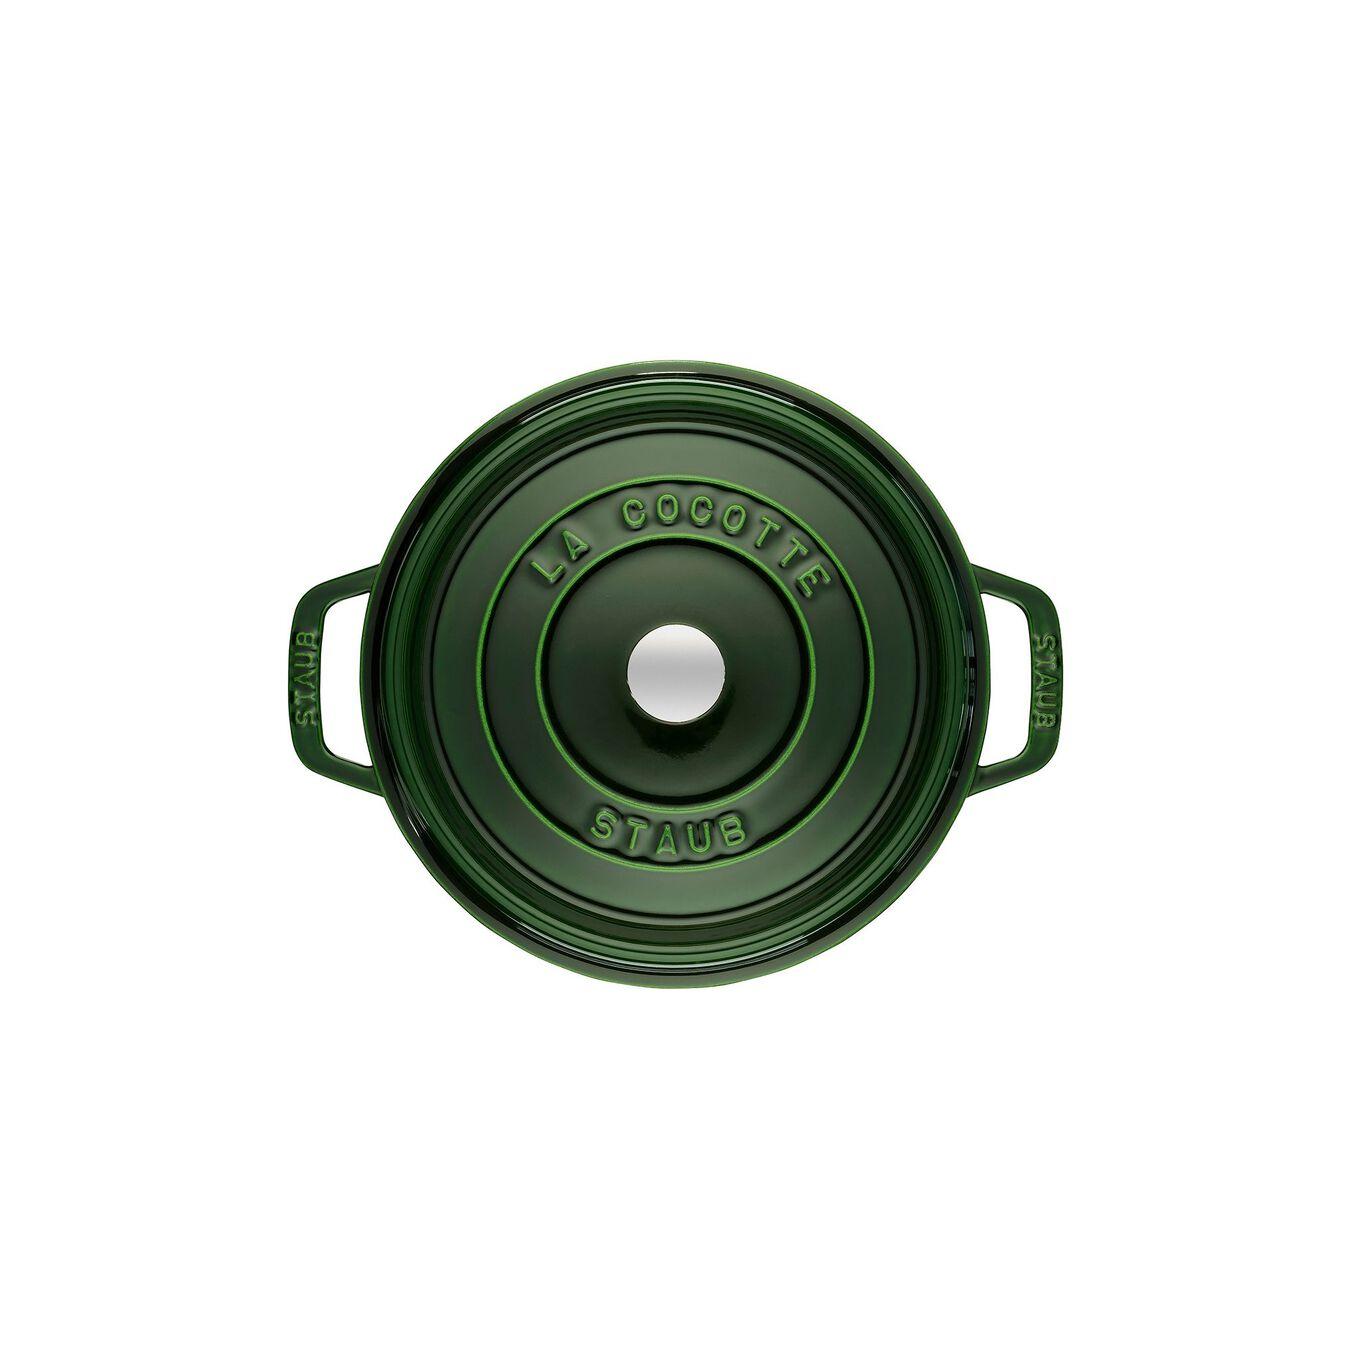 Döküm Tencere, 24 cm | Fesleğen | Yuvarlak | Döküm Demir,,large 2